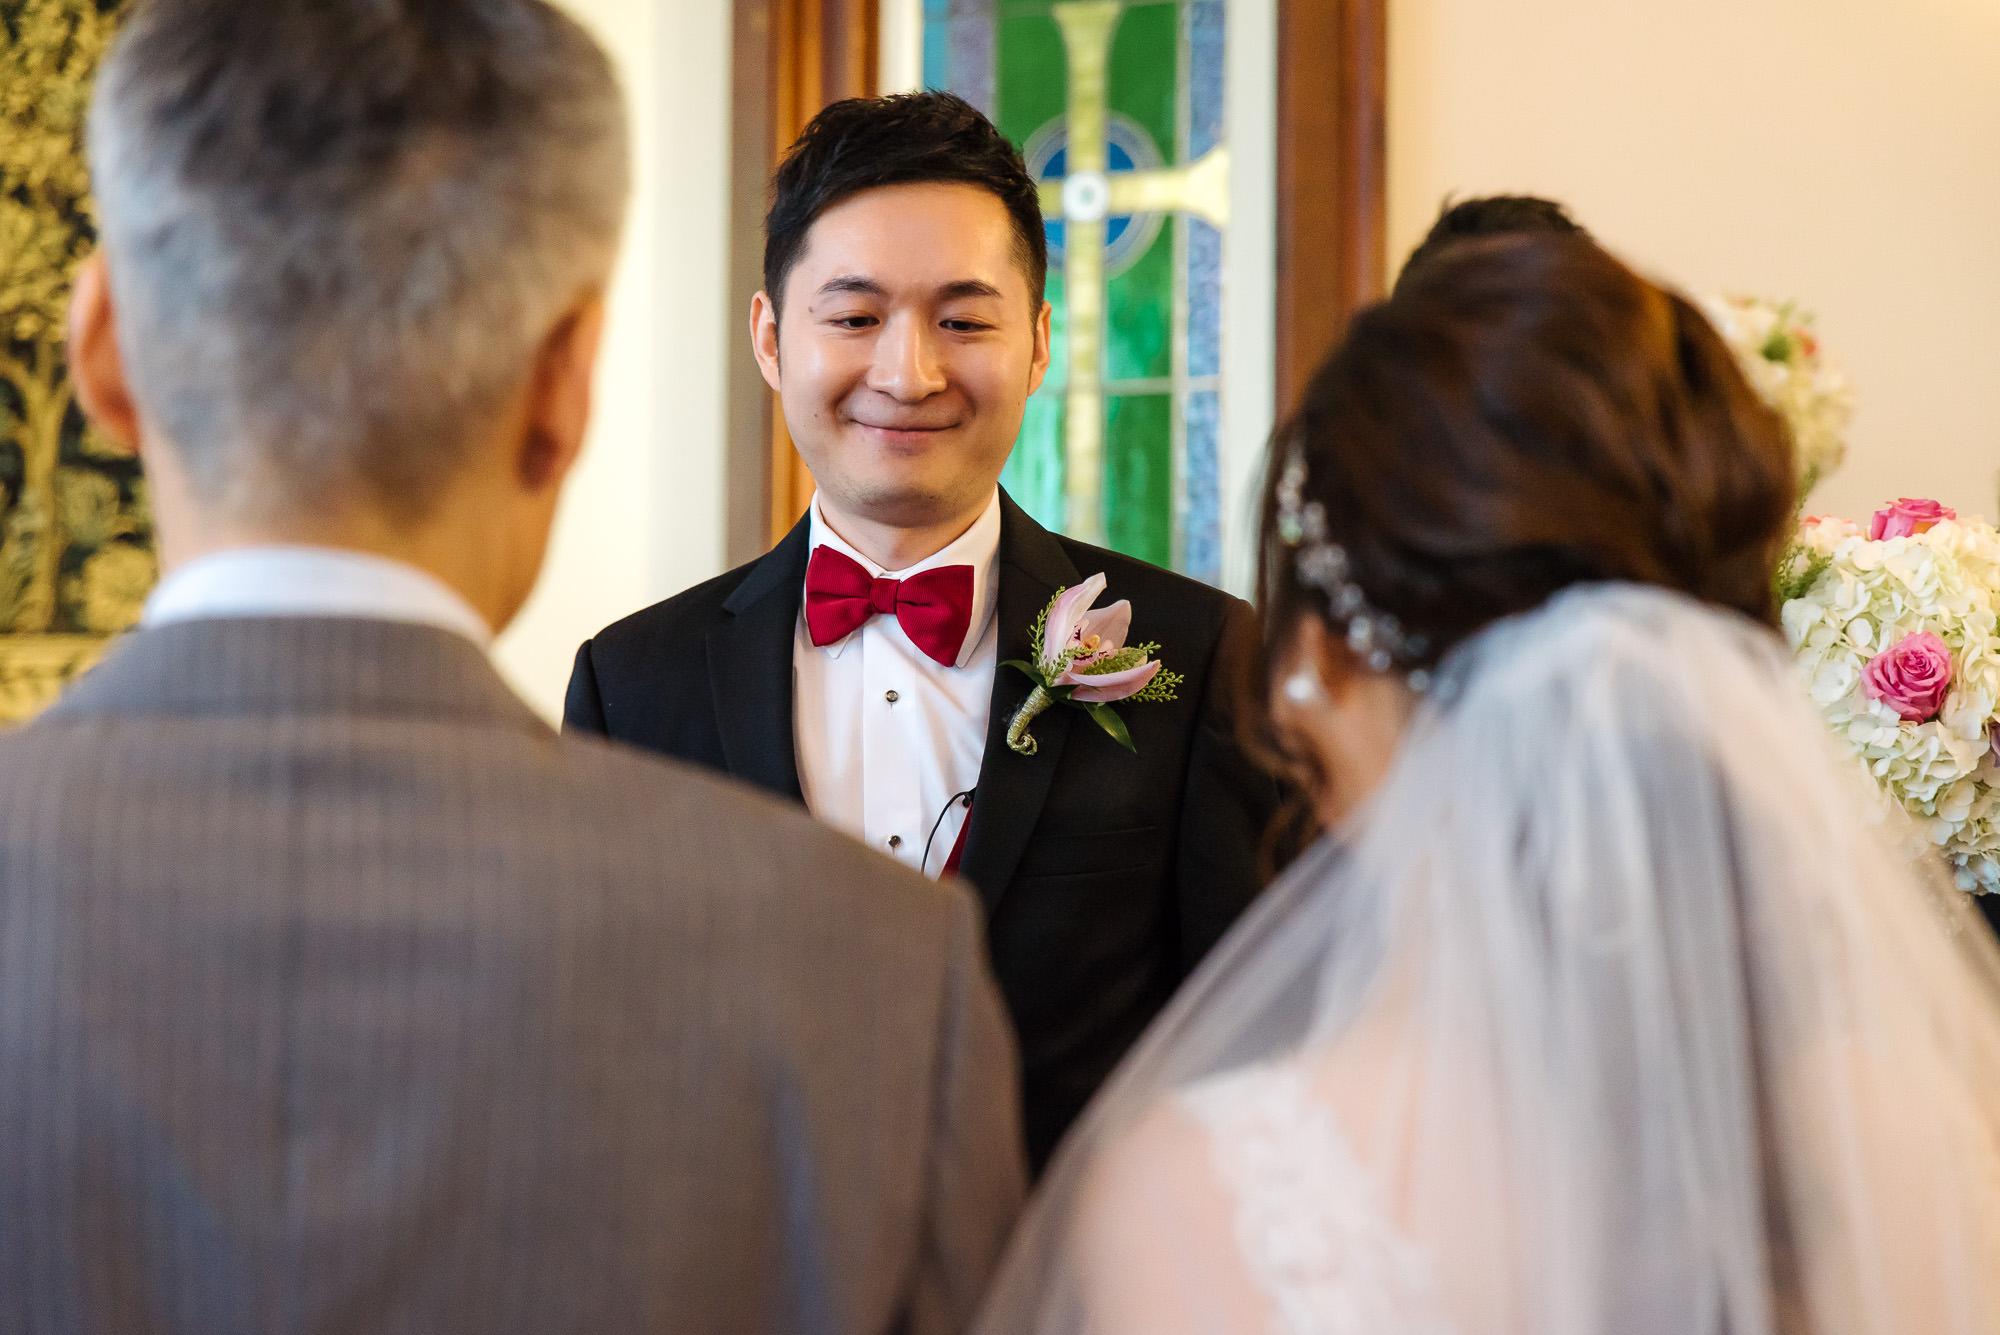 minoru_chapel_richmond_wedding_ceremony 1605294.jpg